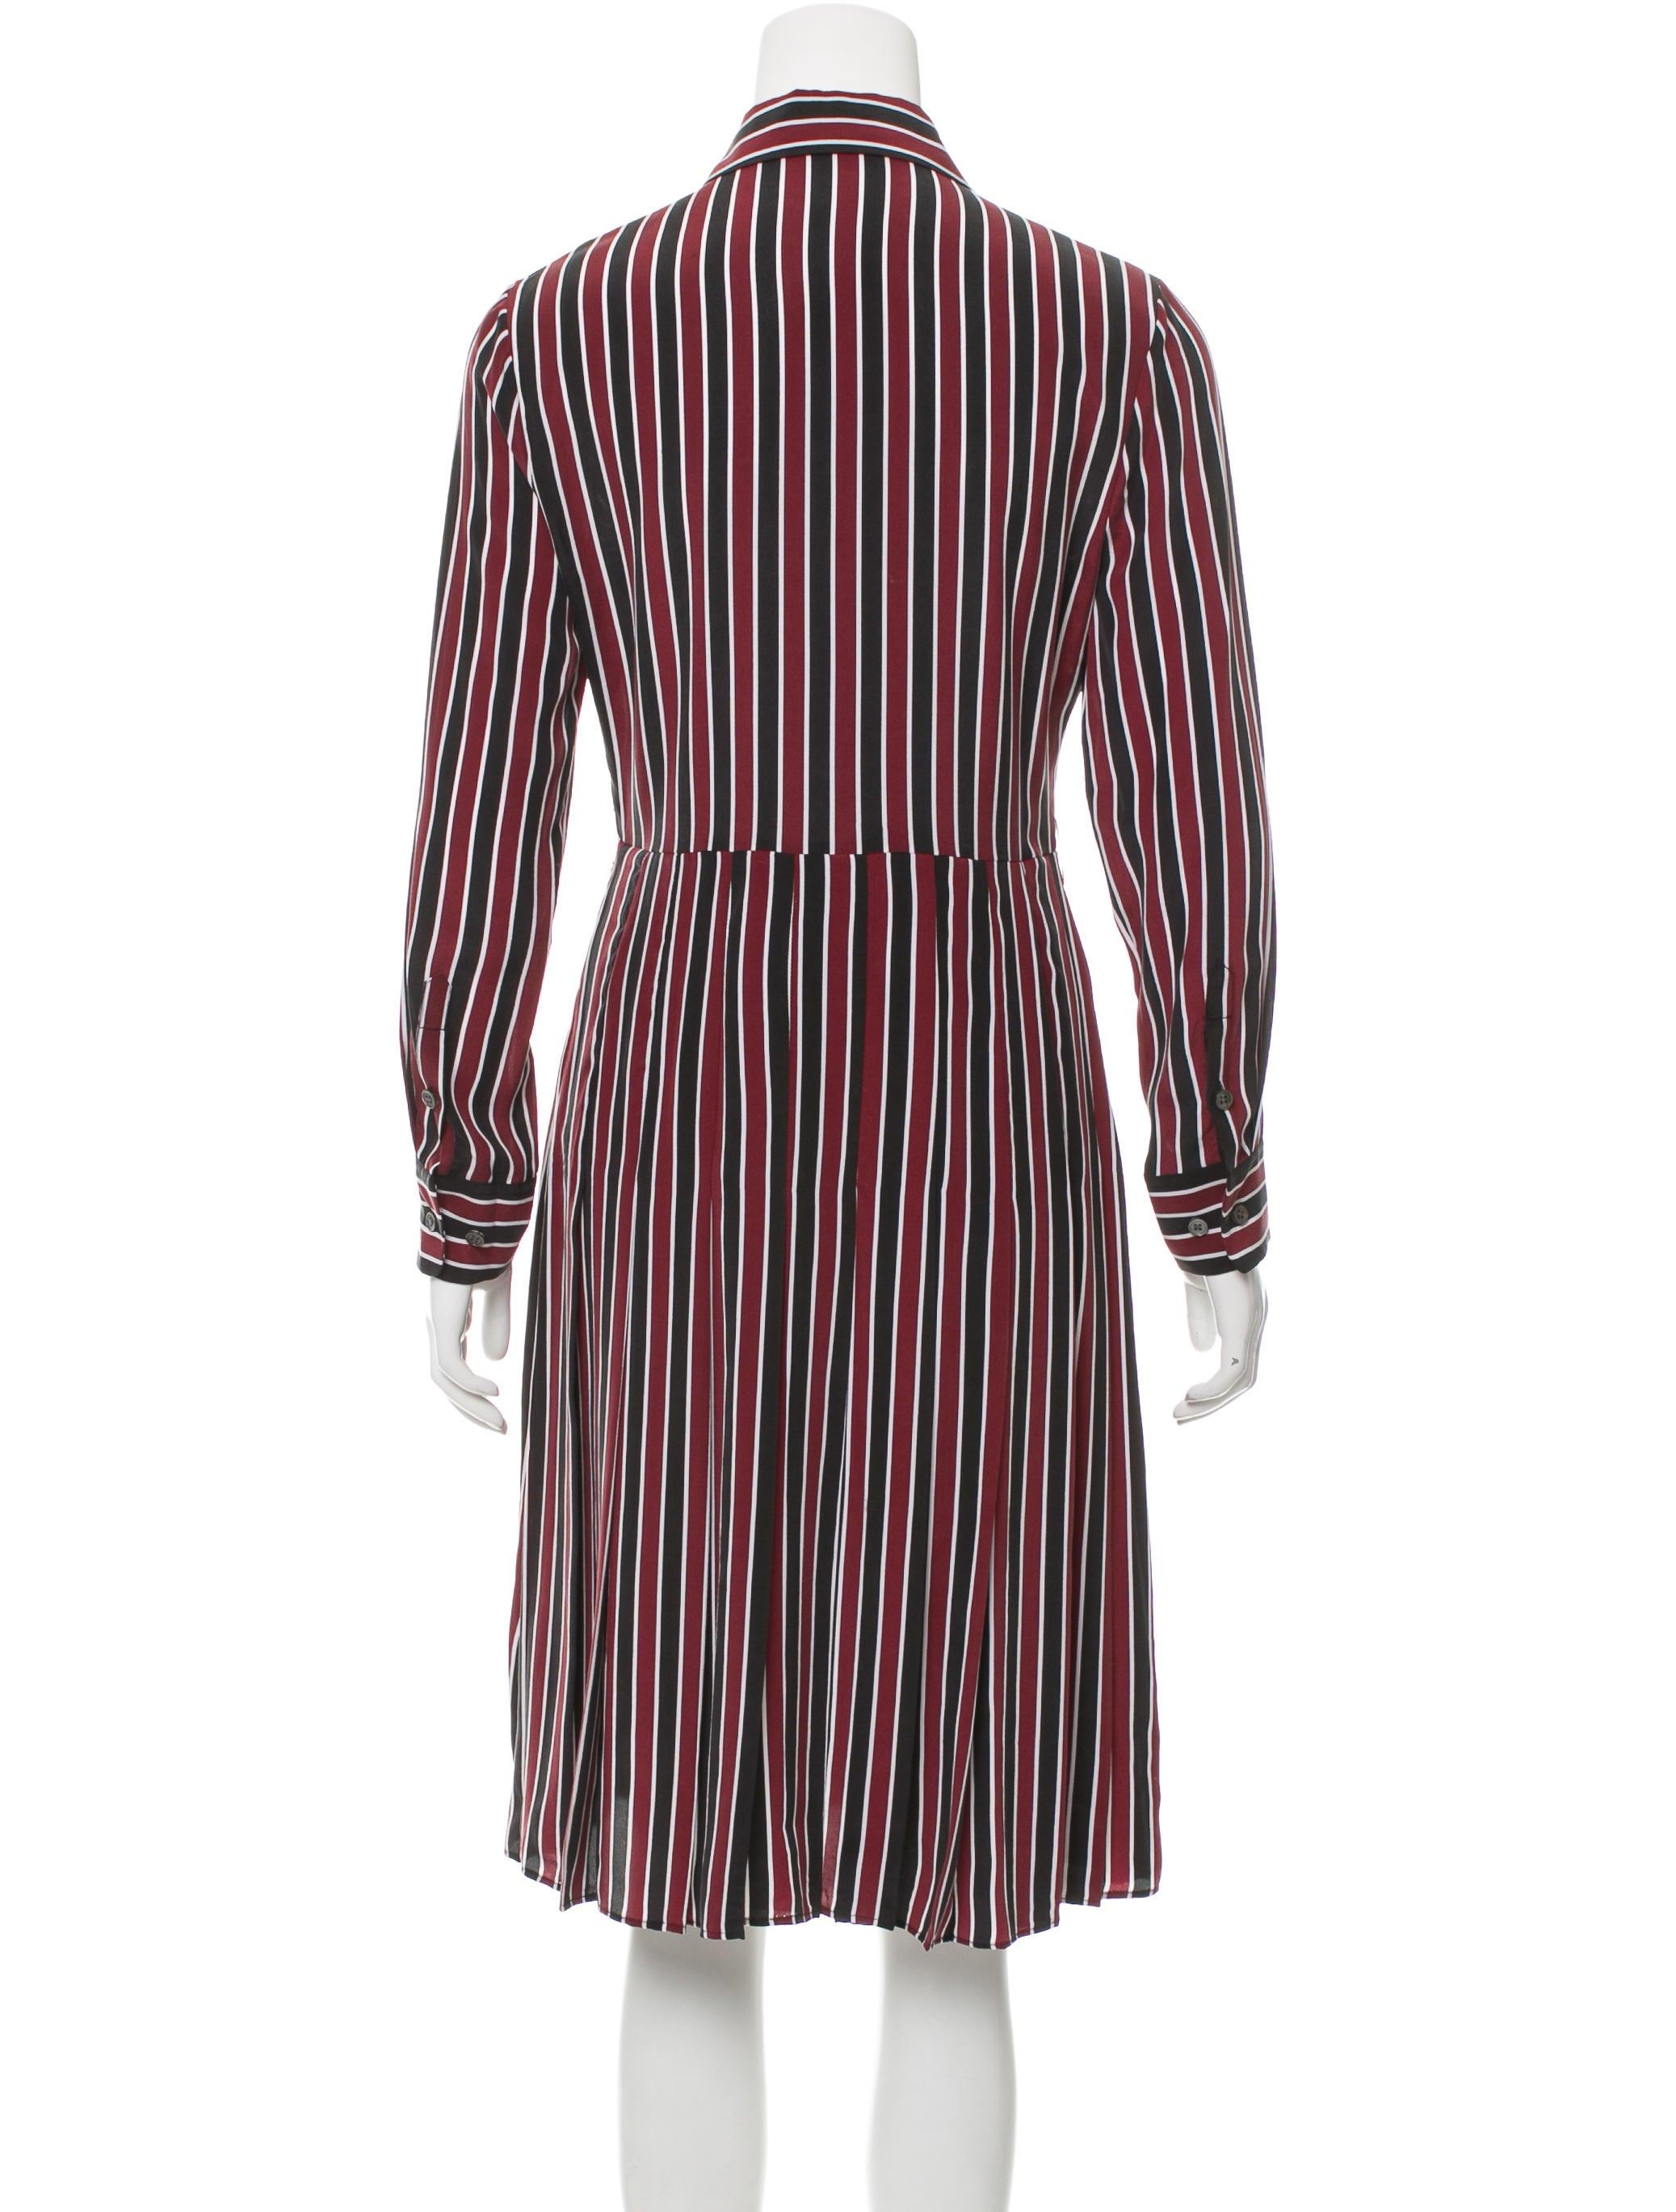 Equipment silk shirt dress clothing weq34947 the for Equipment black silk shirt